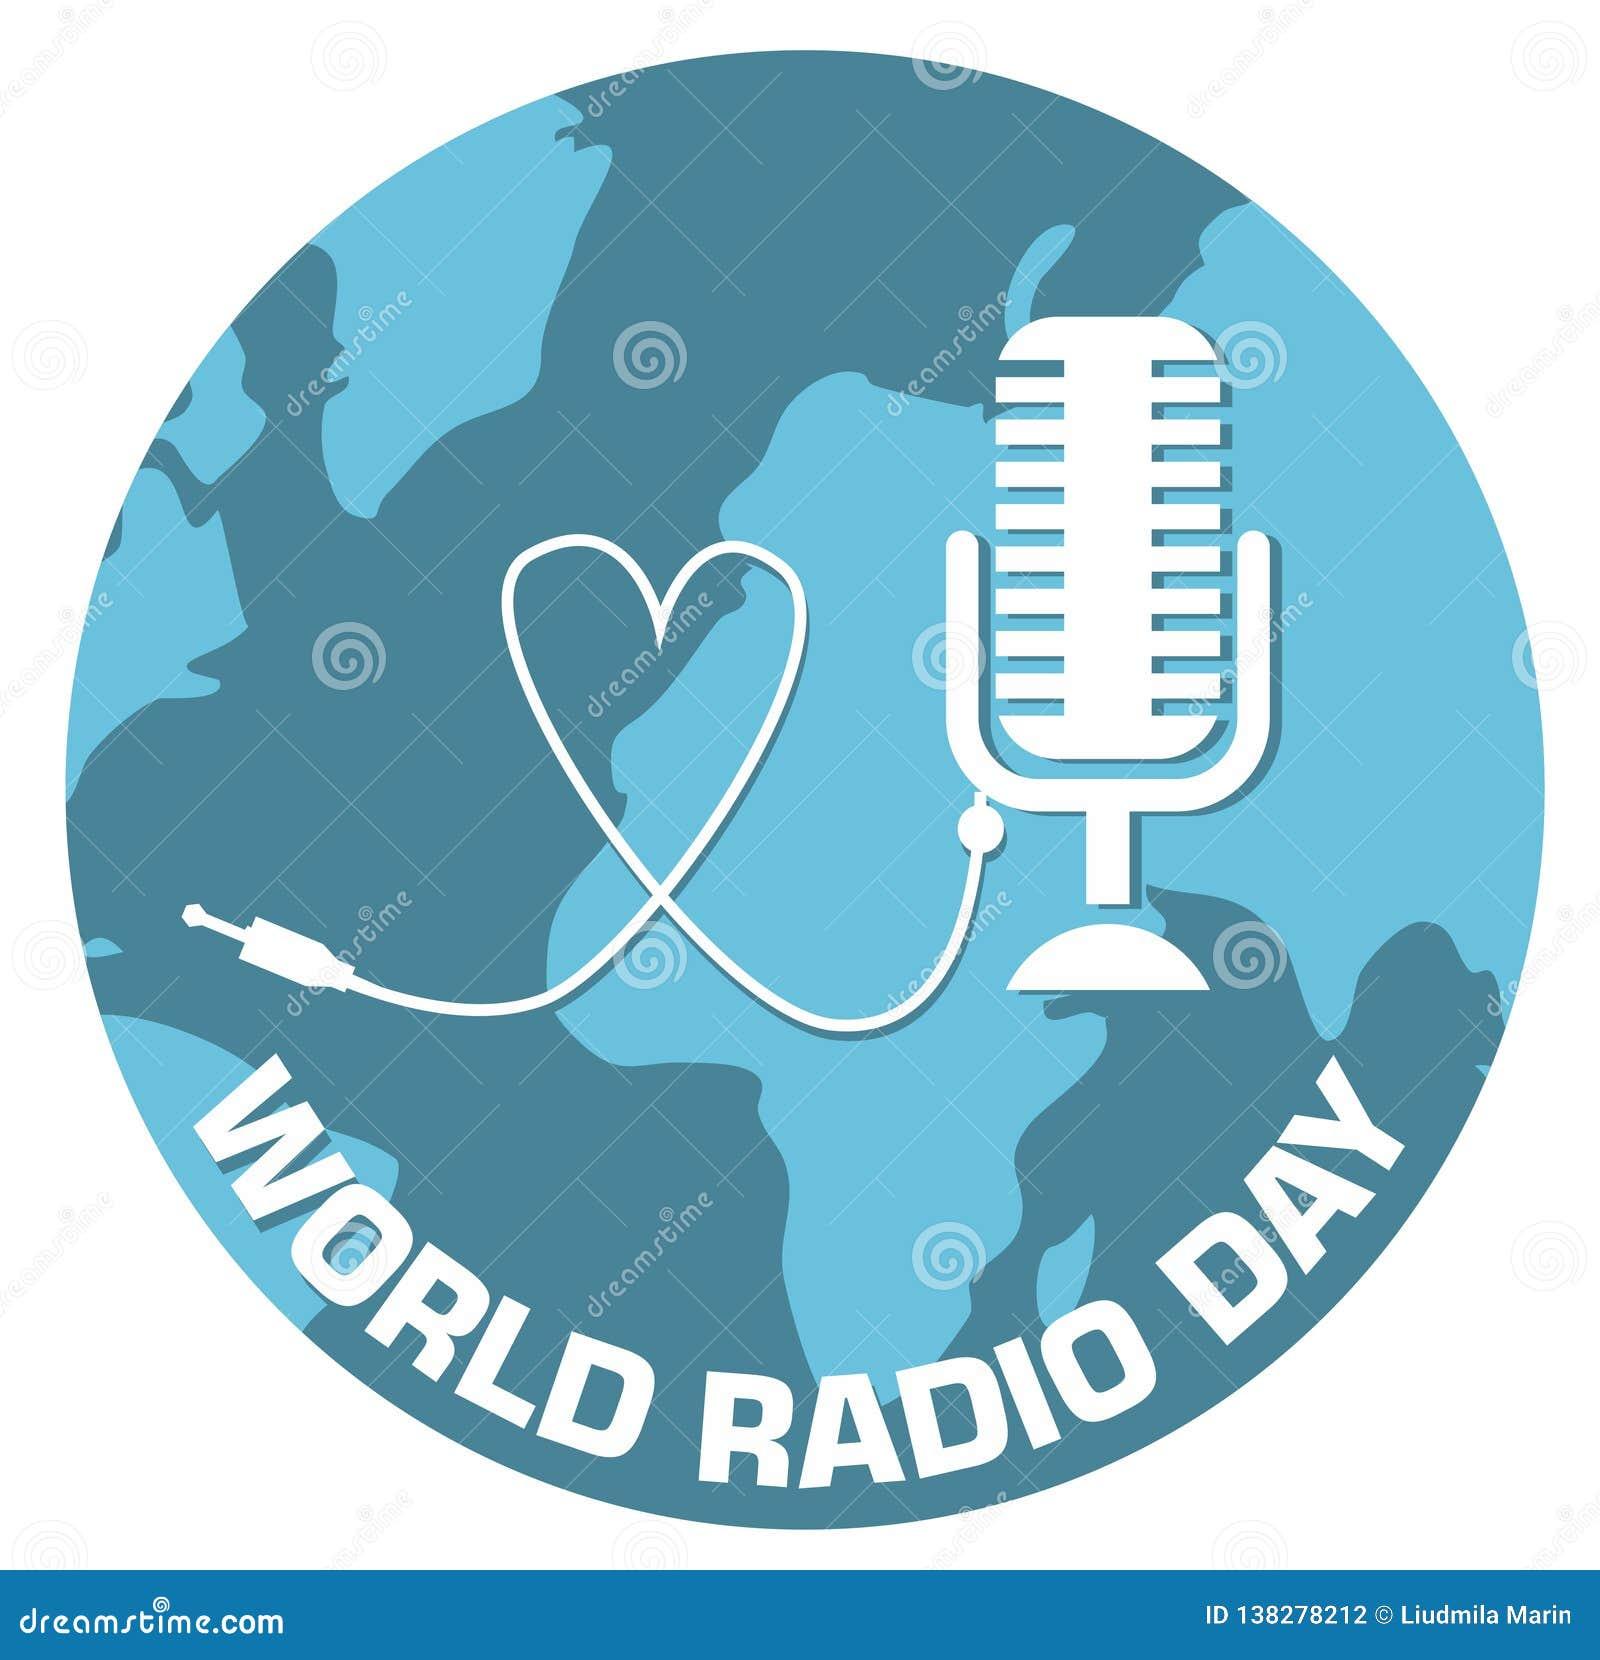 World radio day concept design vector illustration